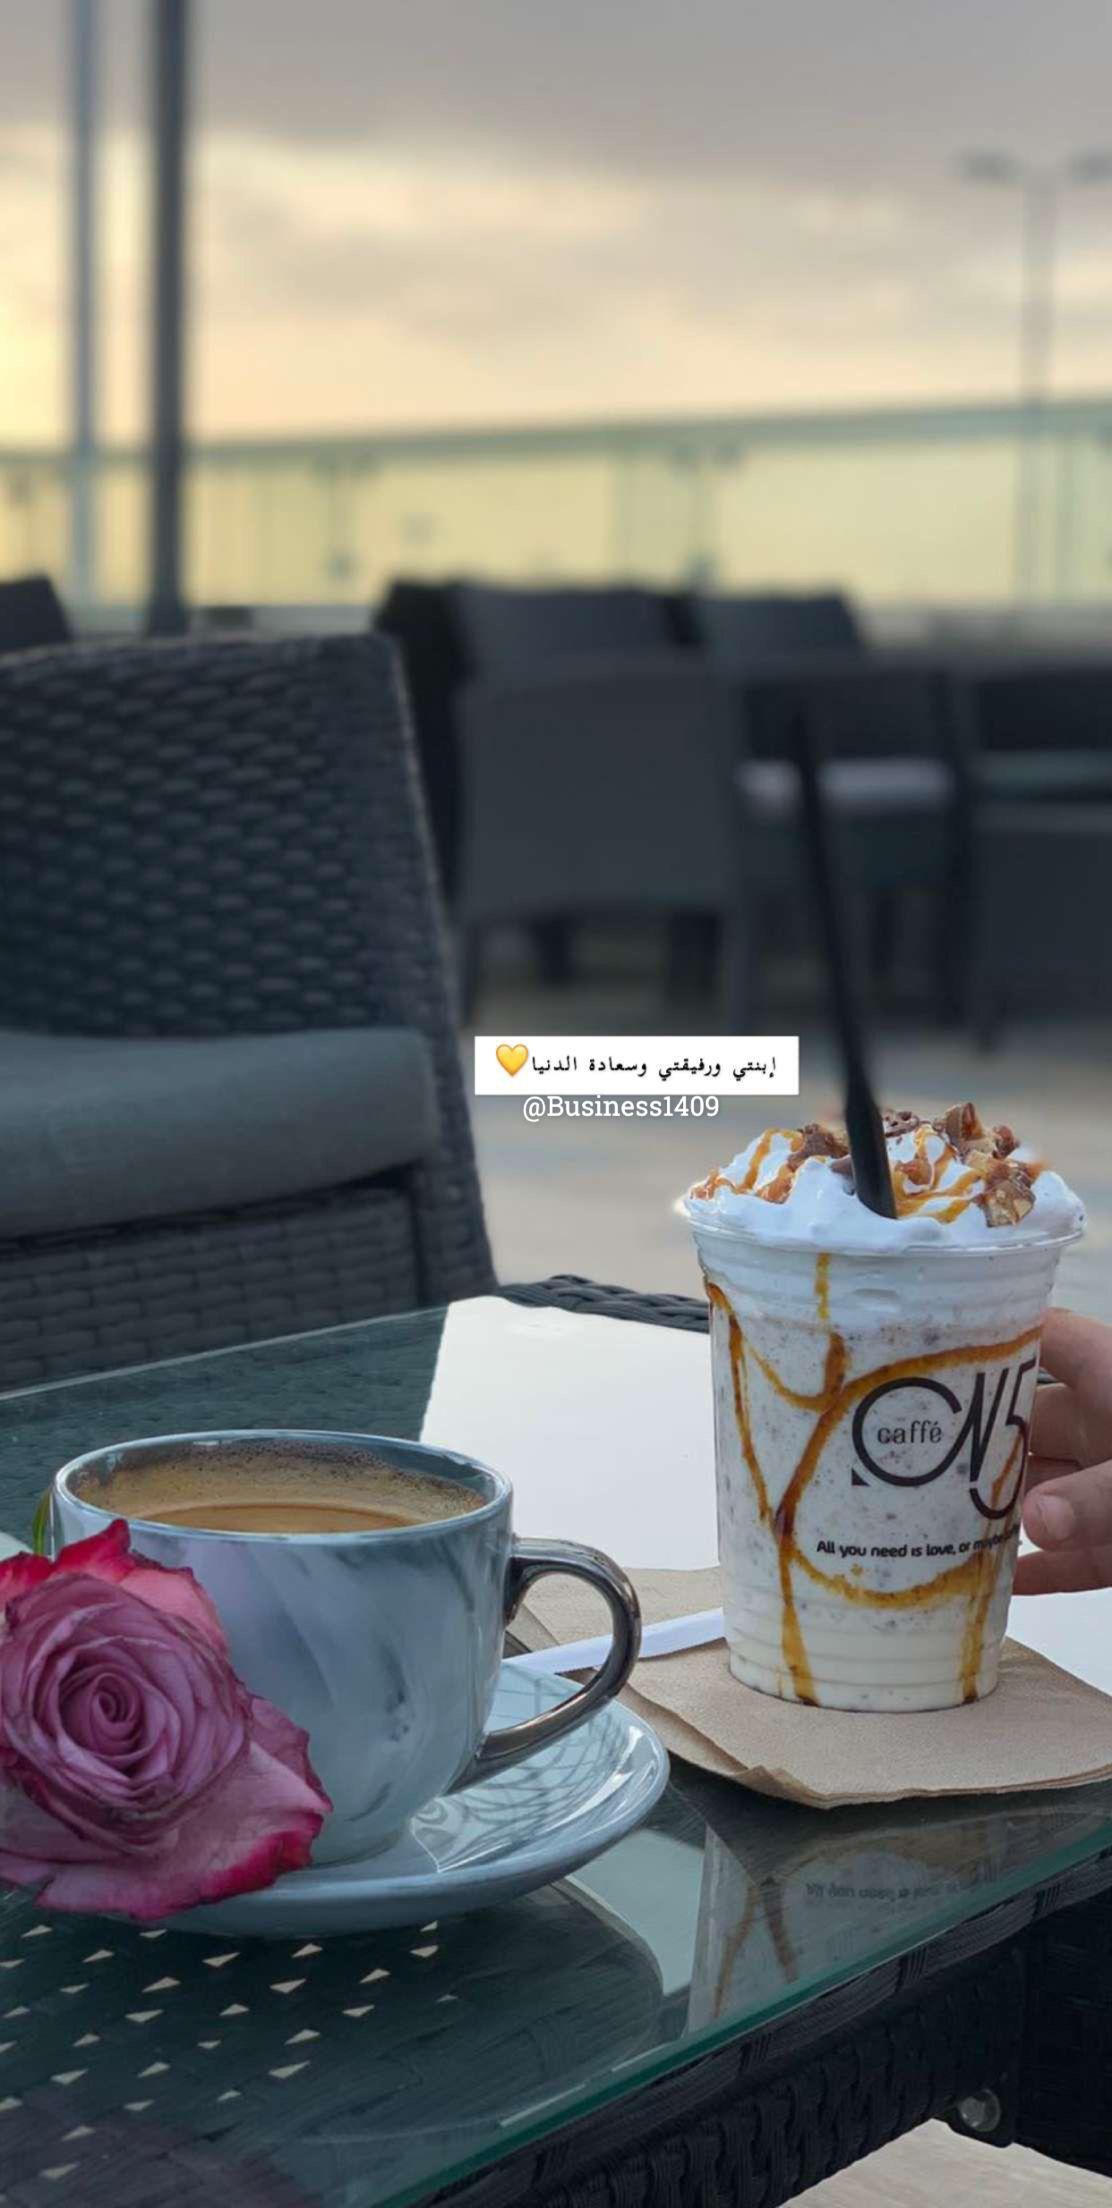 سناب هناء الالمعي In 2021 Belief Quotes Coffee Time Photo